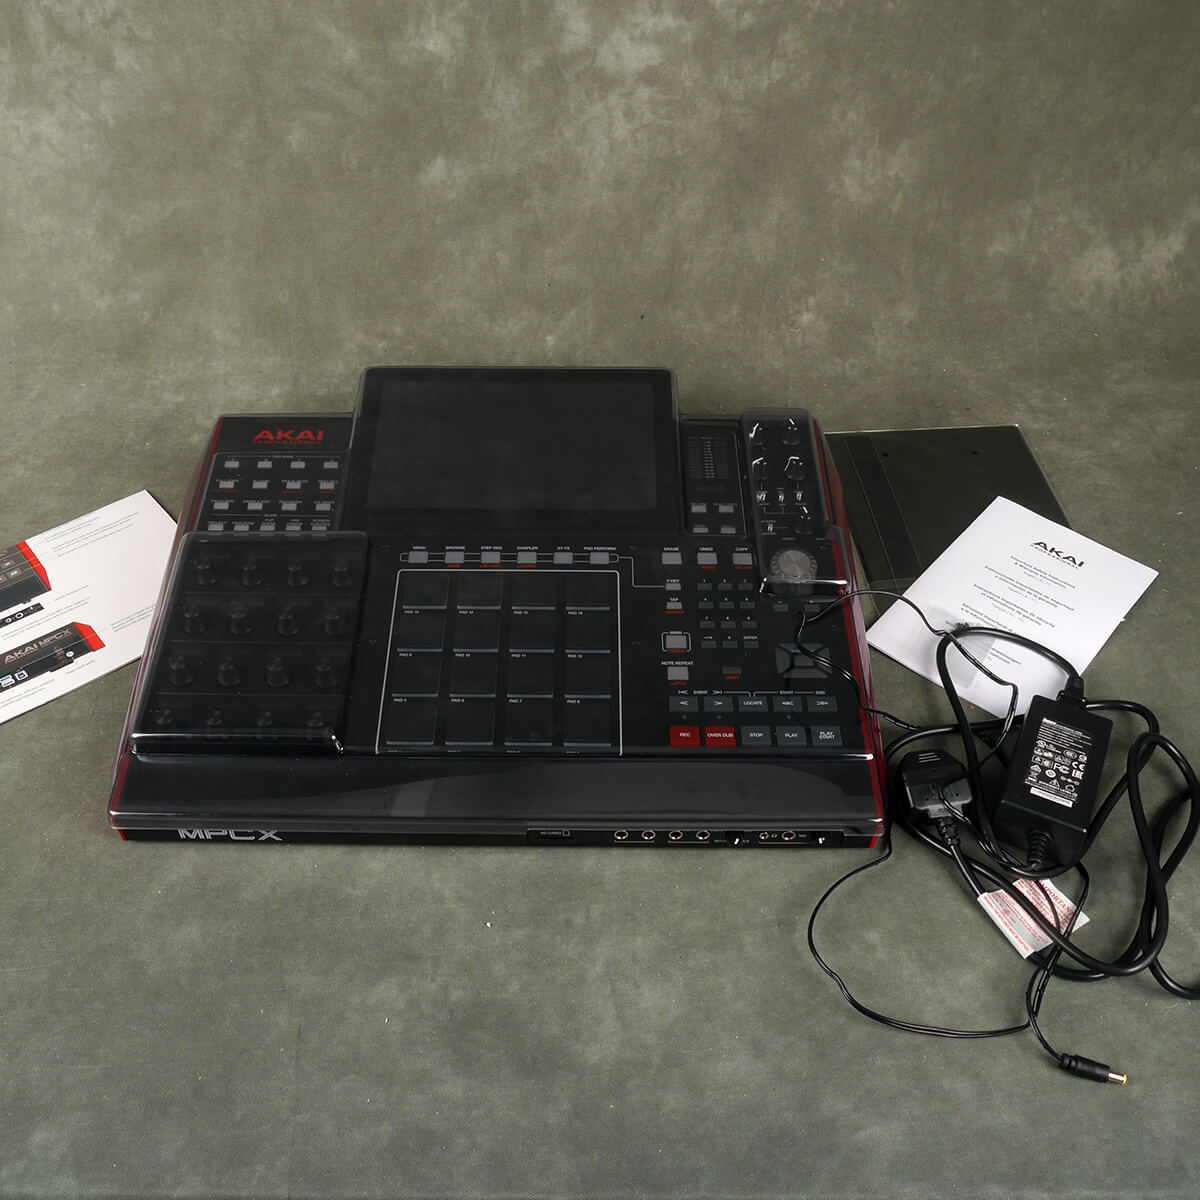 Akai MPC X Standalone Production Machine w/Cover - 2nd Hand